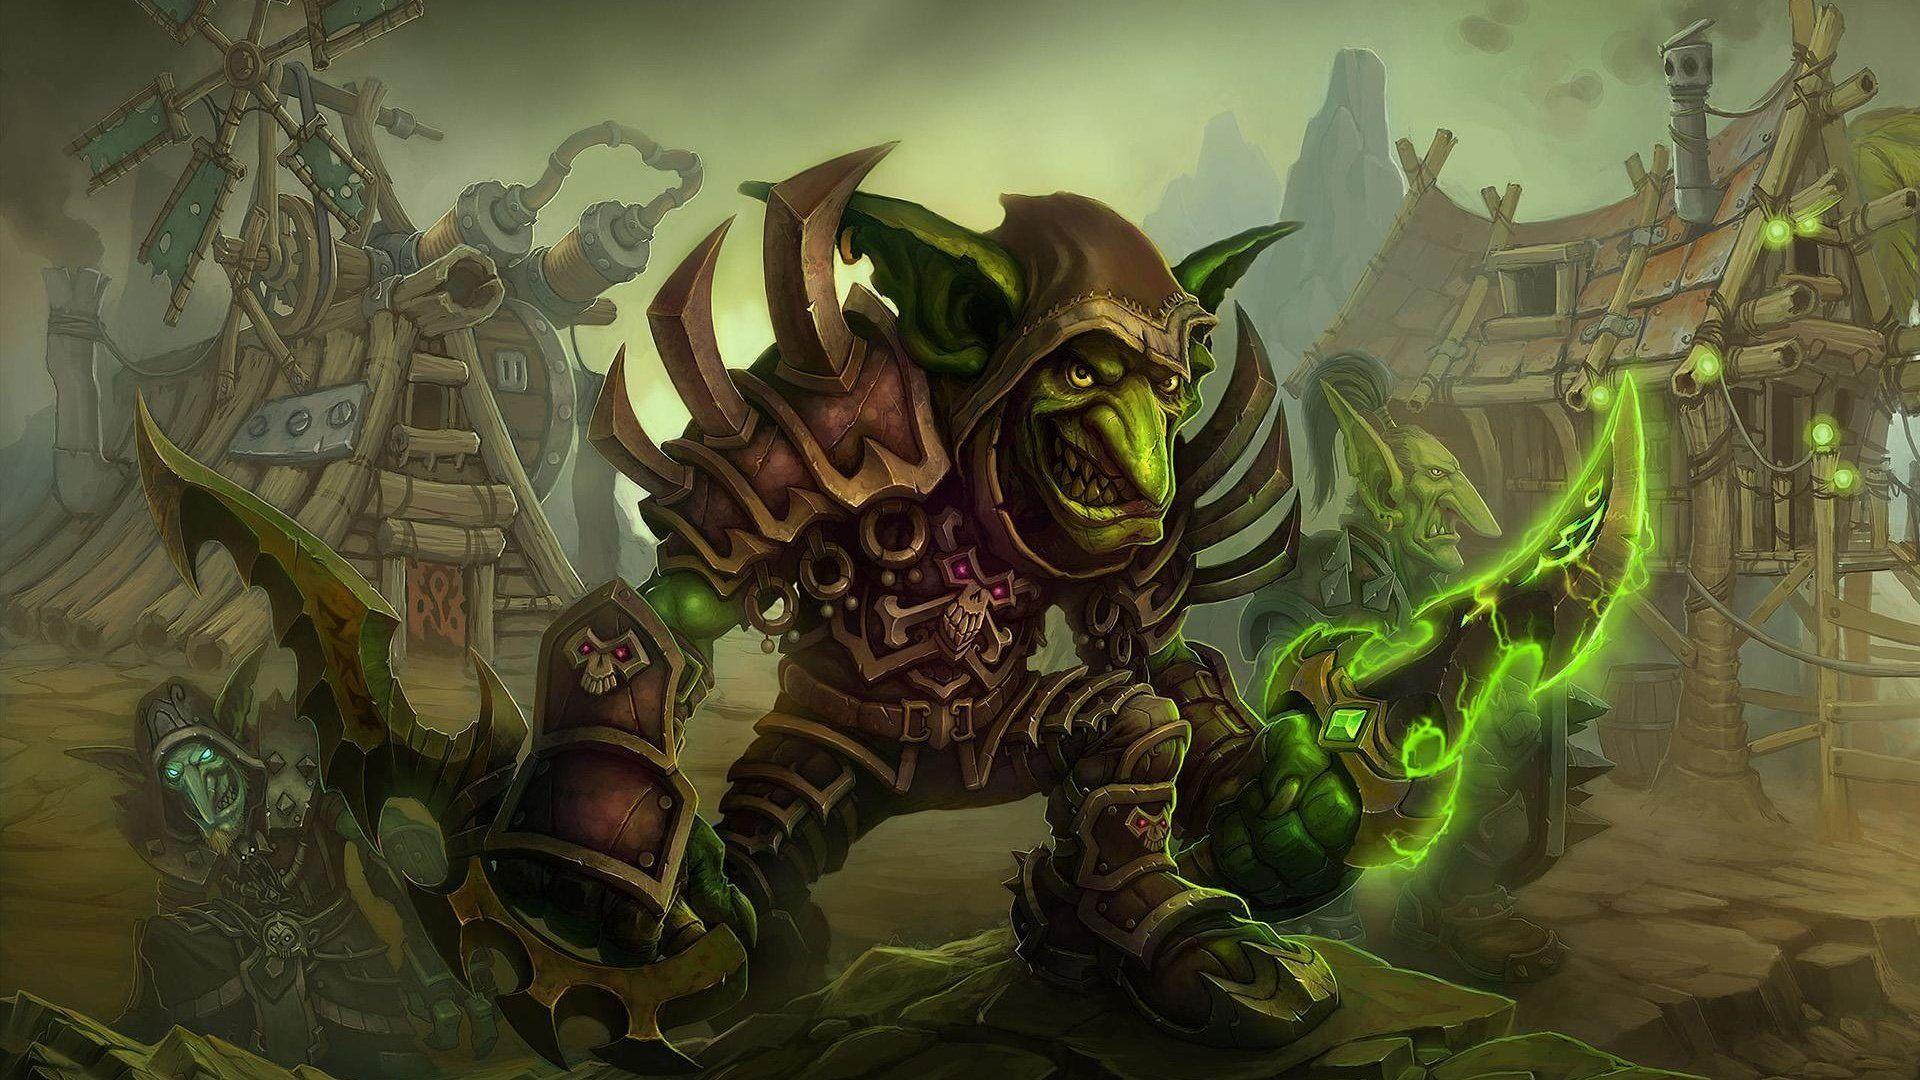 The Village Wallpaper, World Of Warcraft, Goblin, Cataclysm, Village, World Of Warcraft